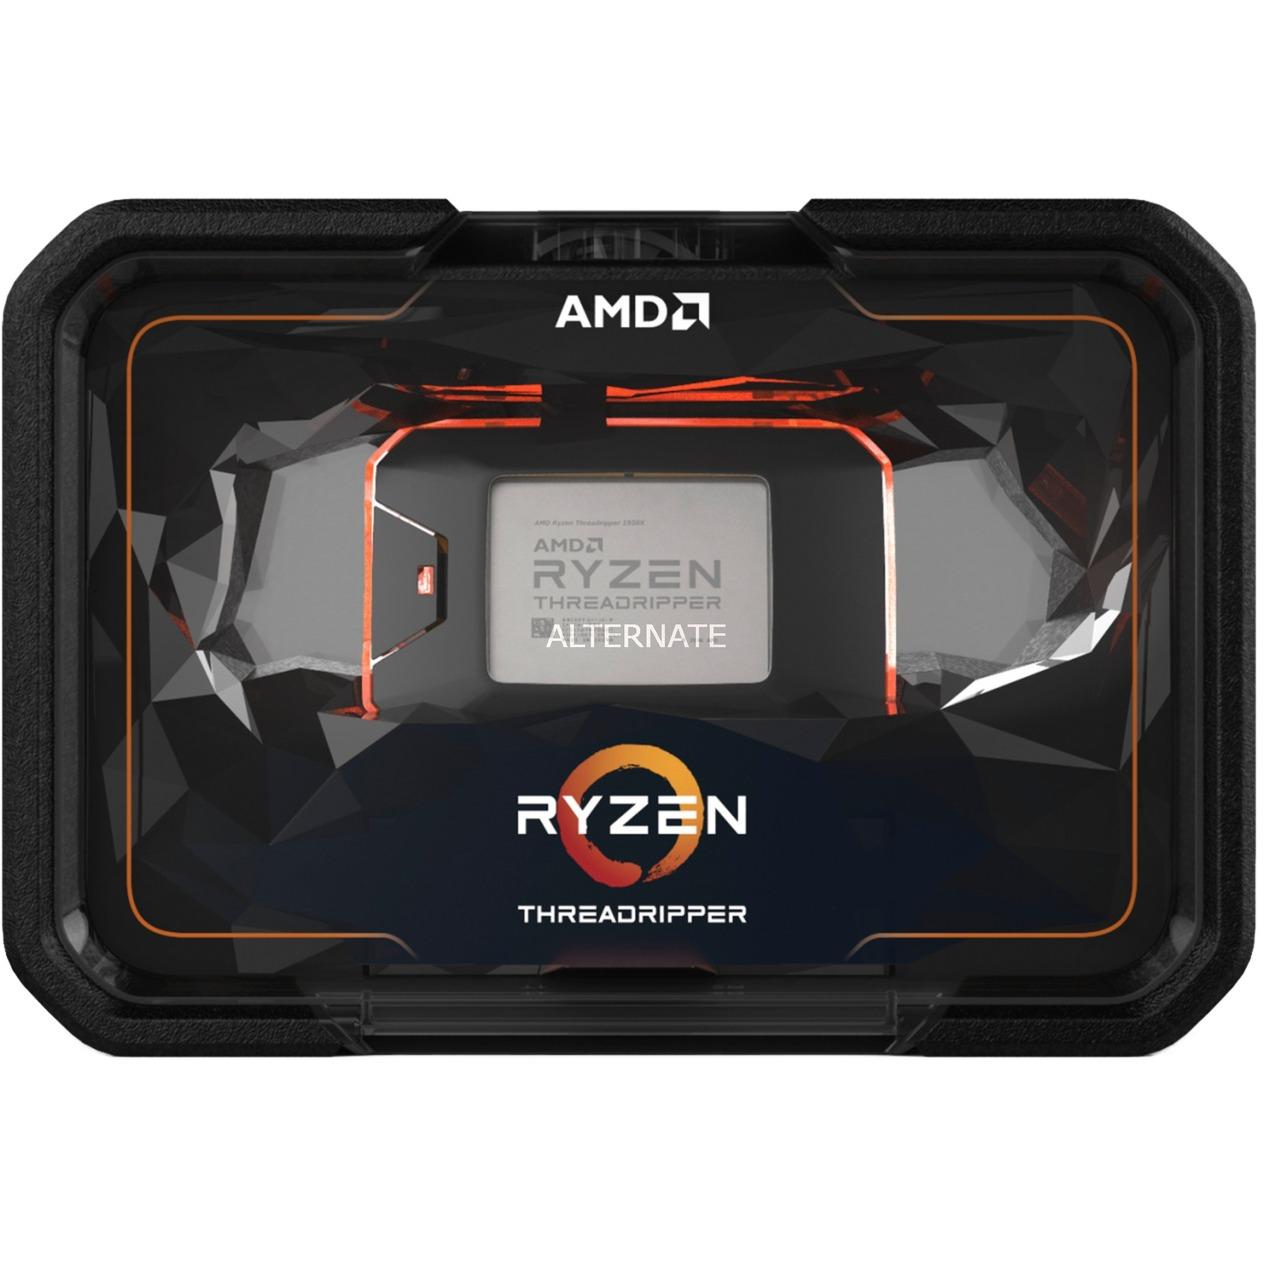 Ryzen Threadripper 2990WX 3GHz 64MB L3 Caja procesador